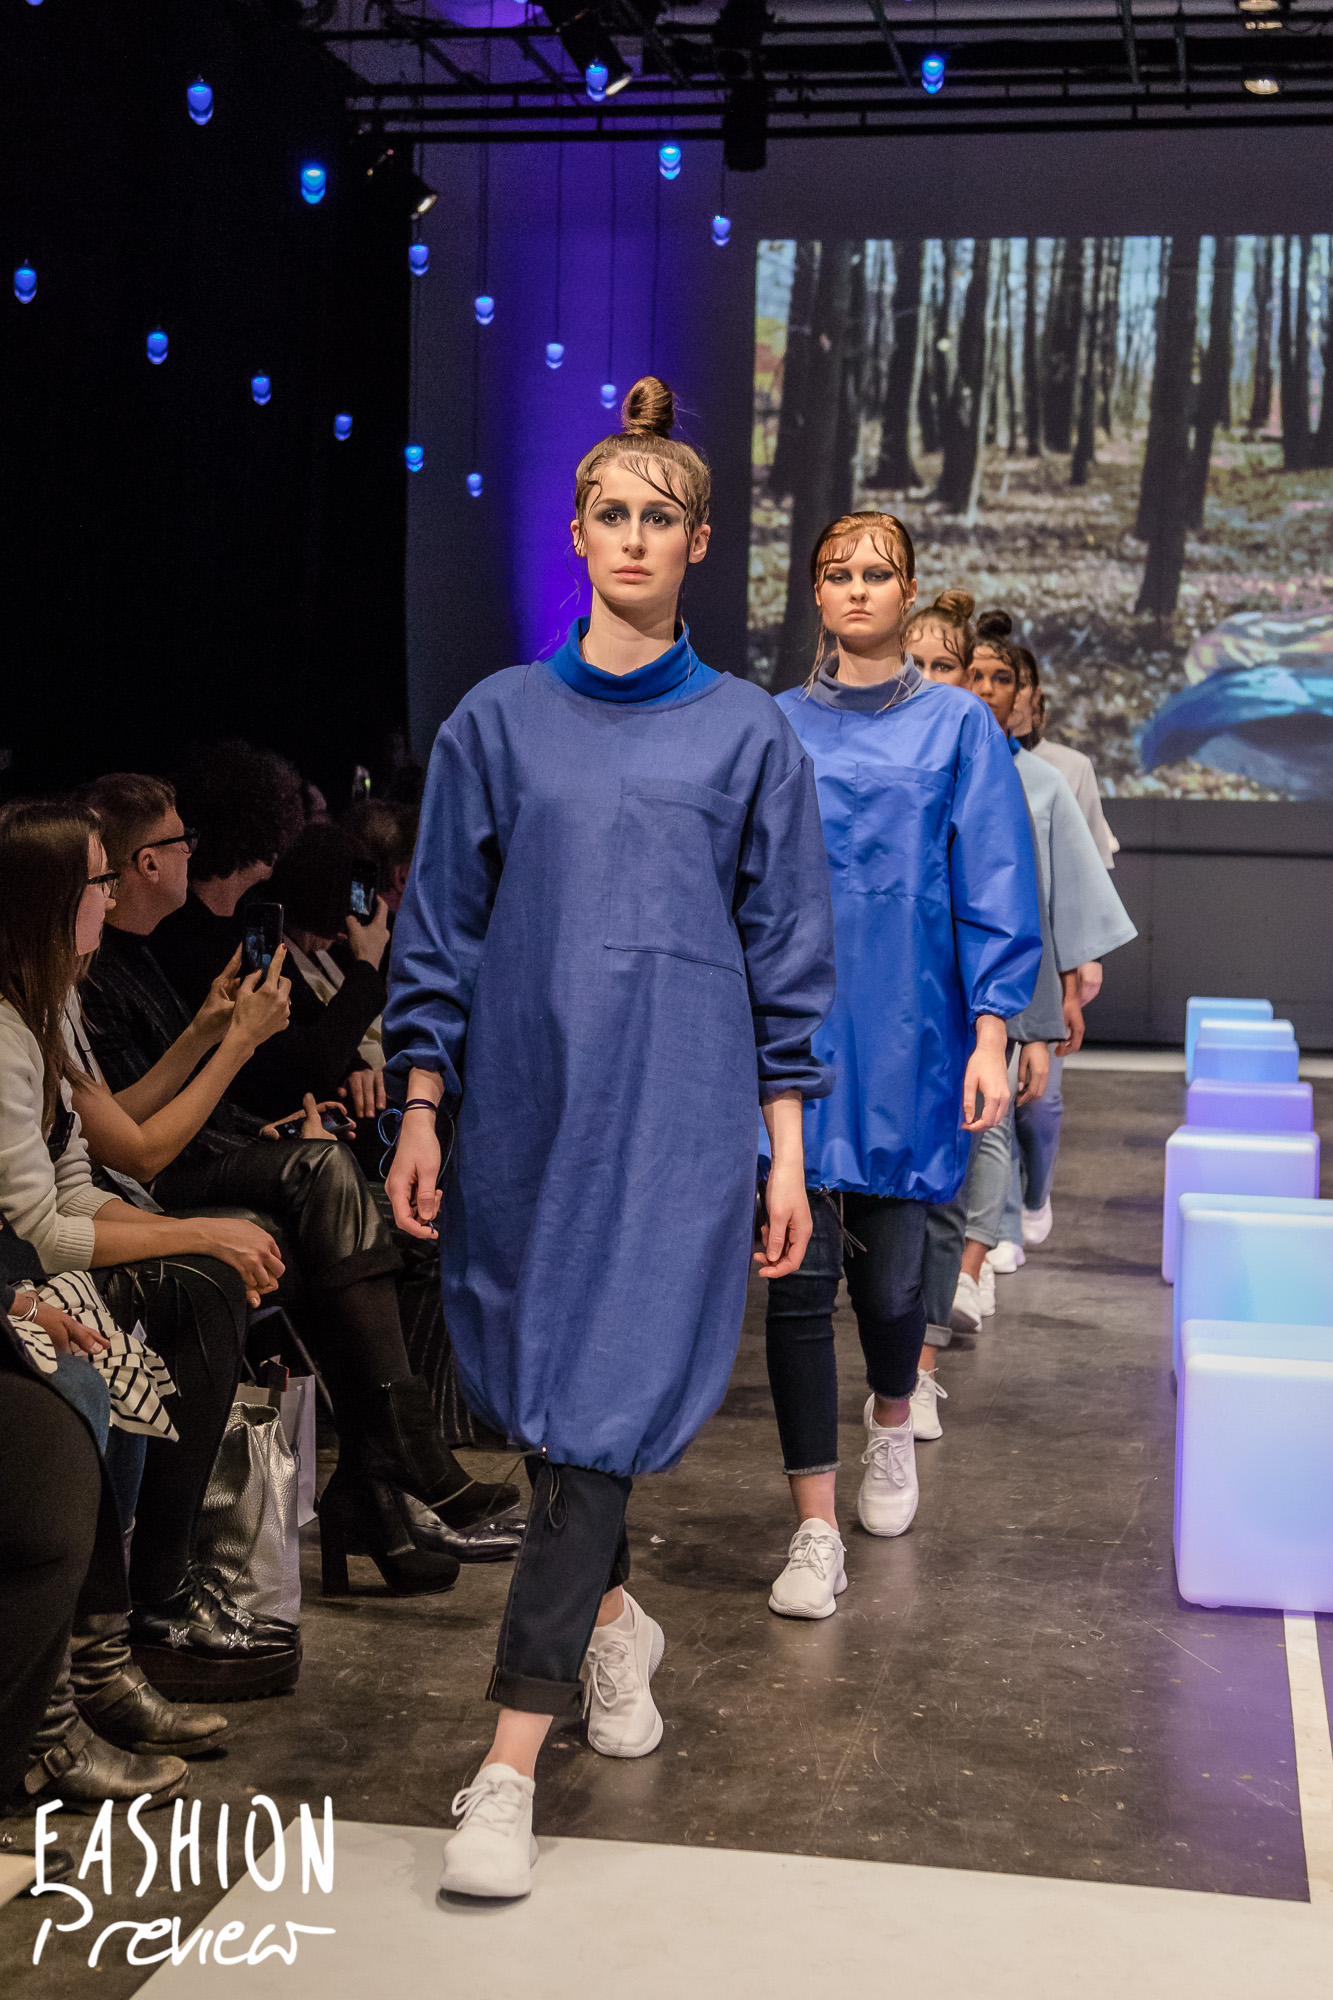 Fashion Preview 9 - Cegep Marie Victorin-03.jpg